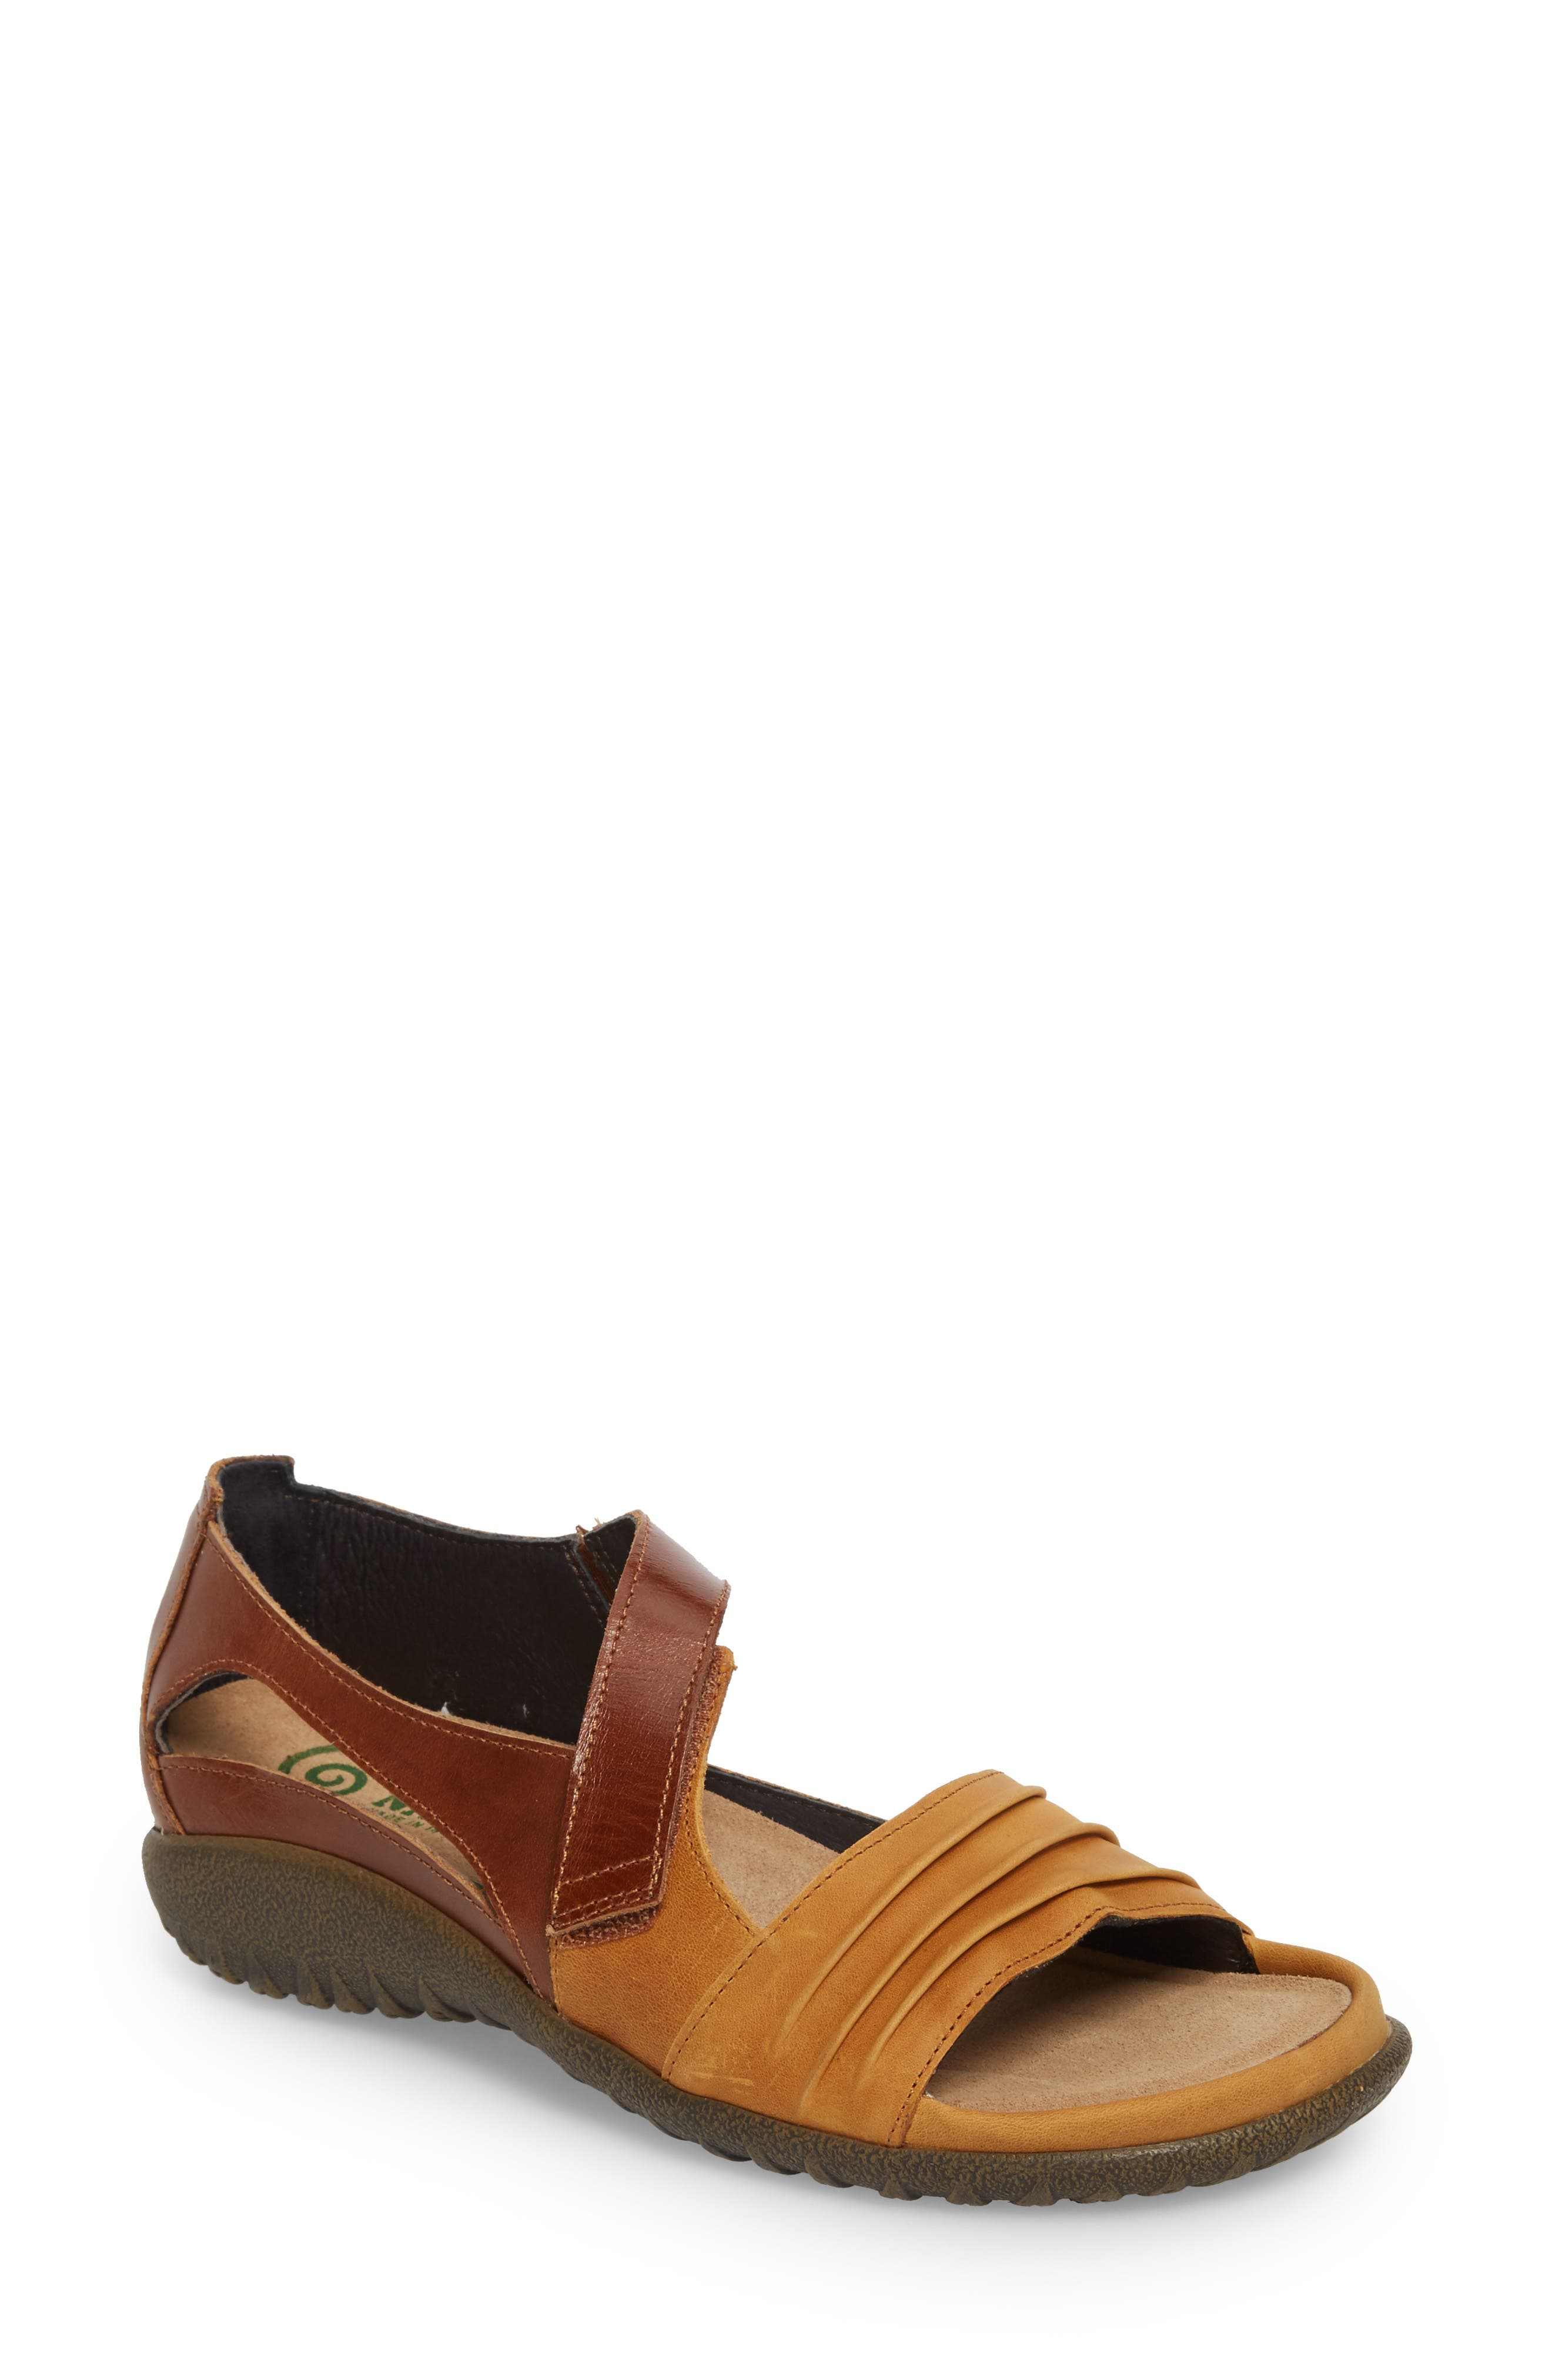 'Papaki' Sandal,                         Main,                         color, OILY DUNE NUBUCK